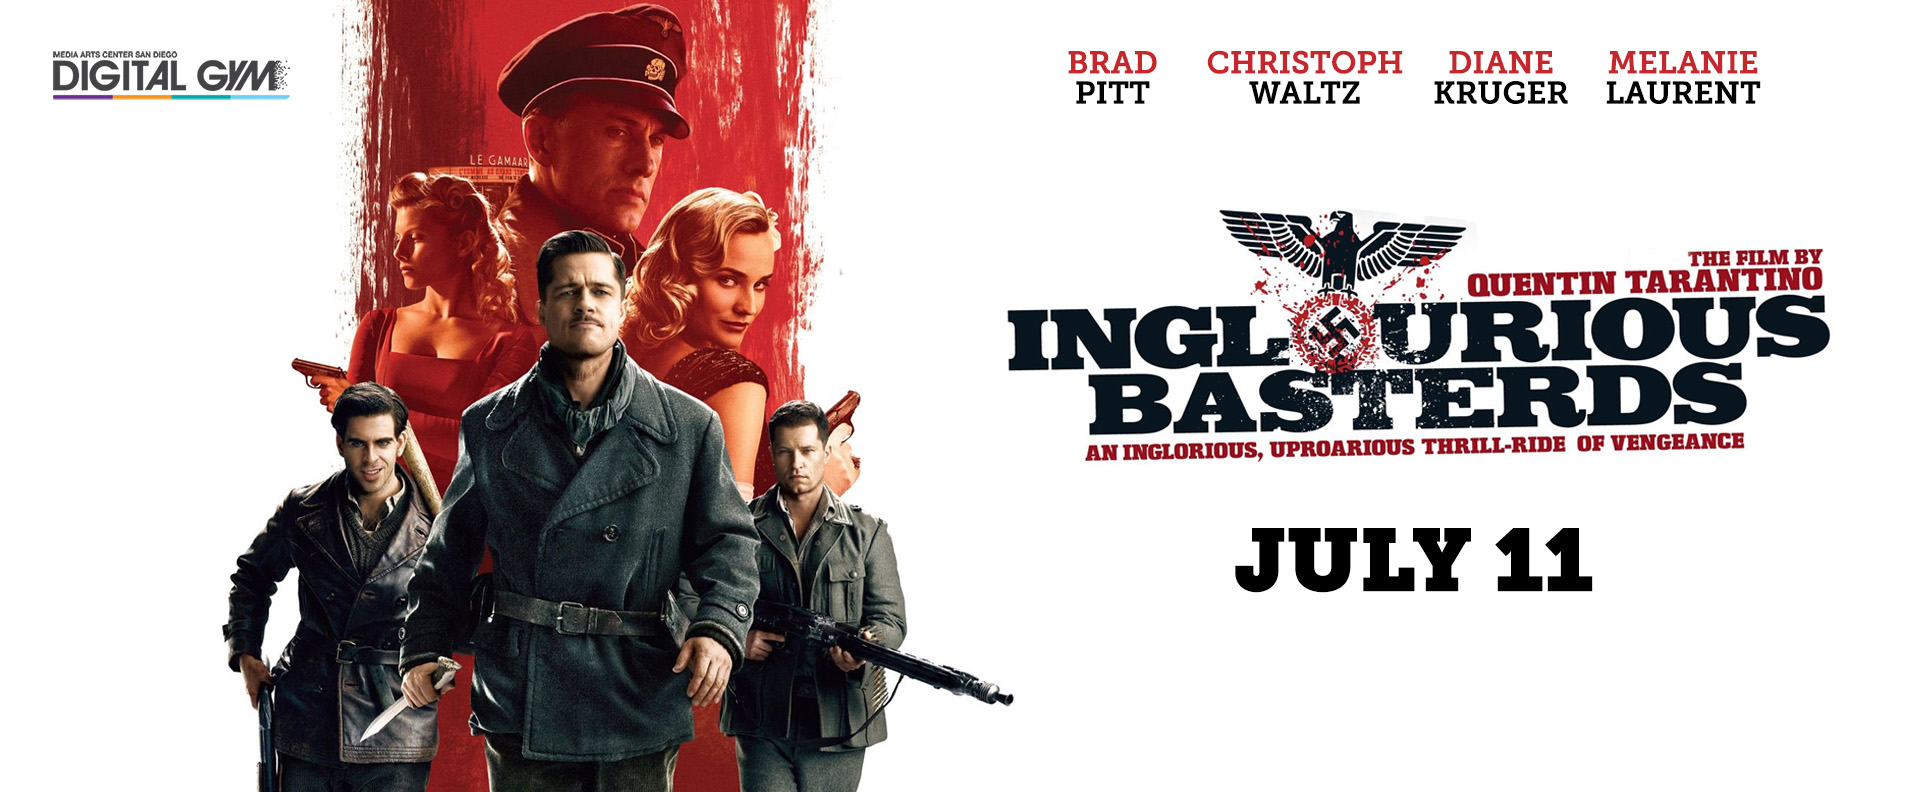 Drop da Mic Presents: Inglourious Basterds (July 11)